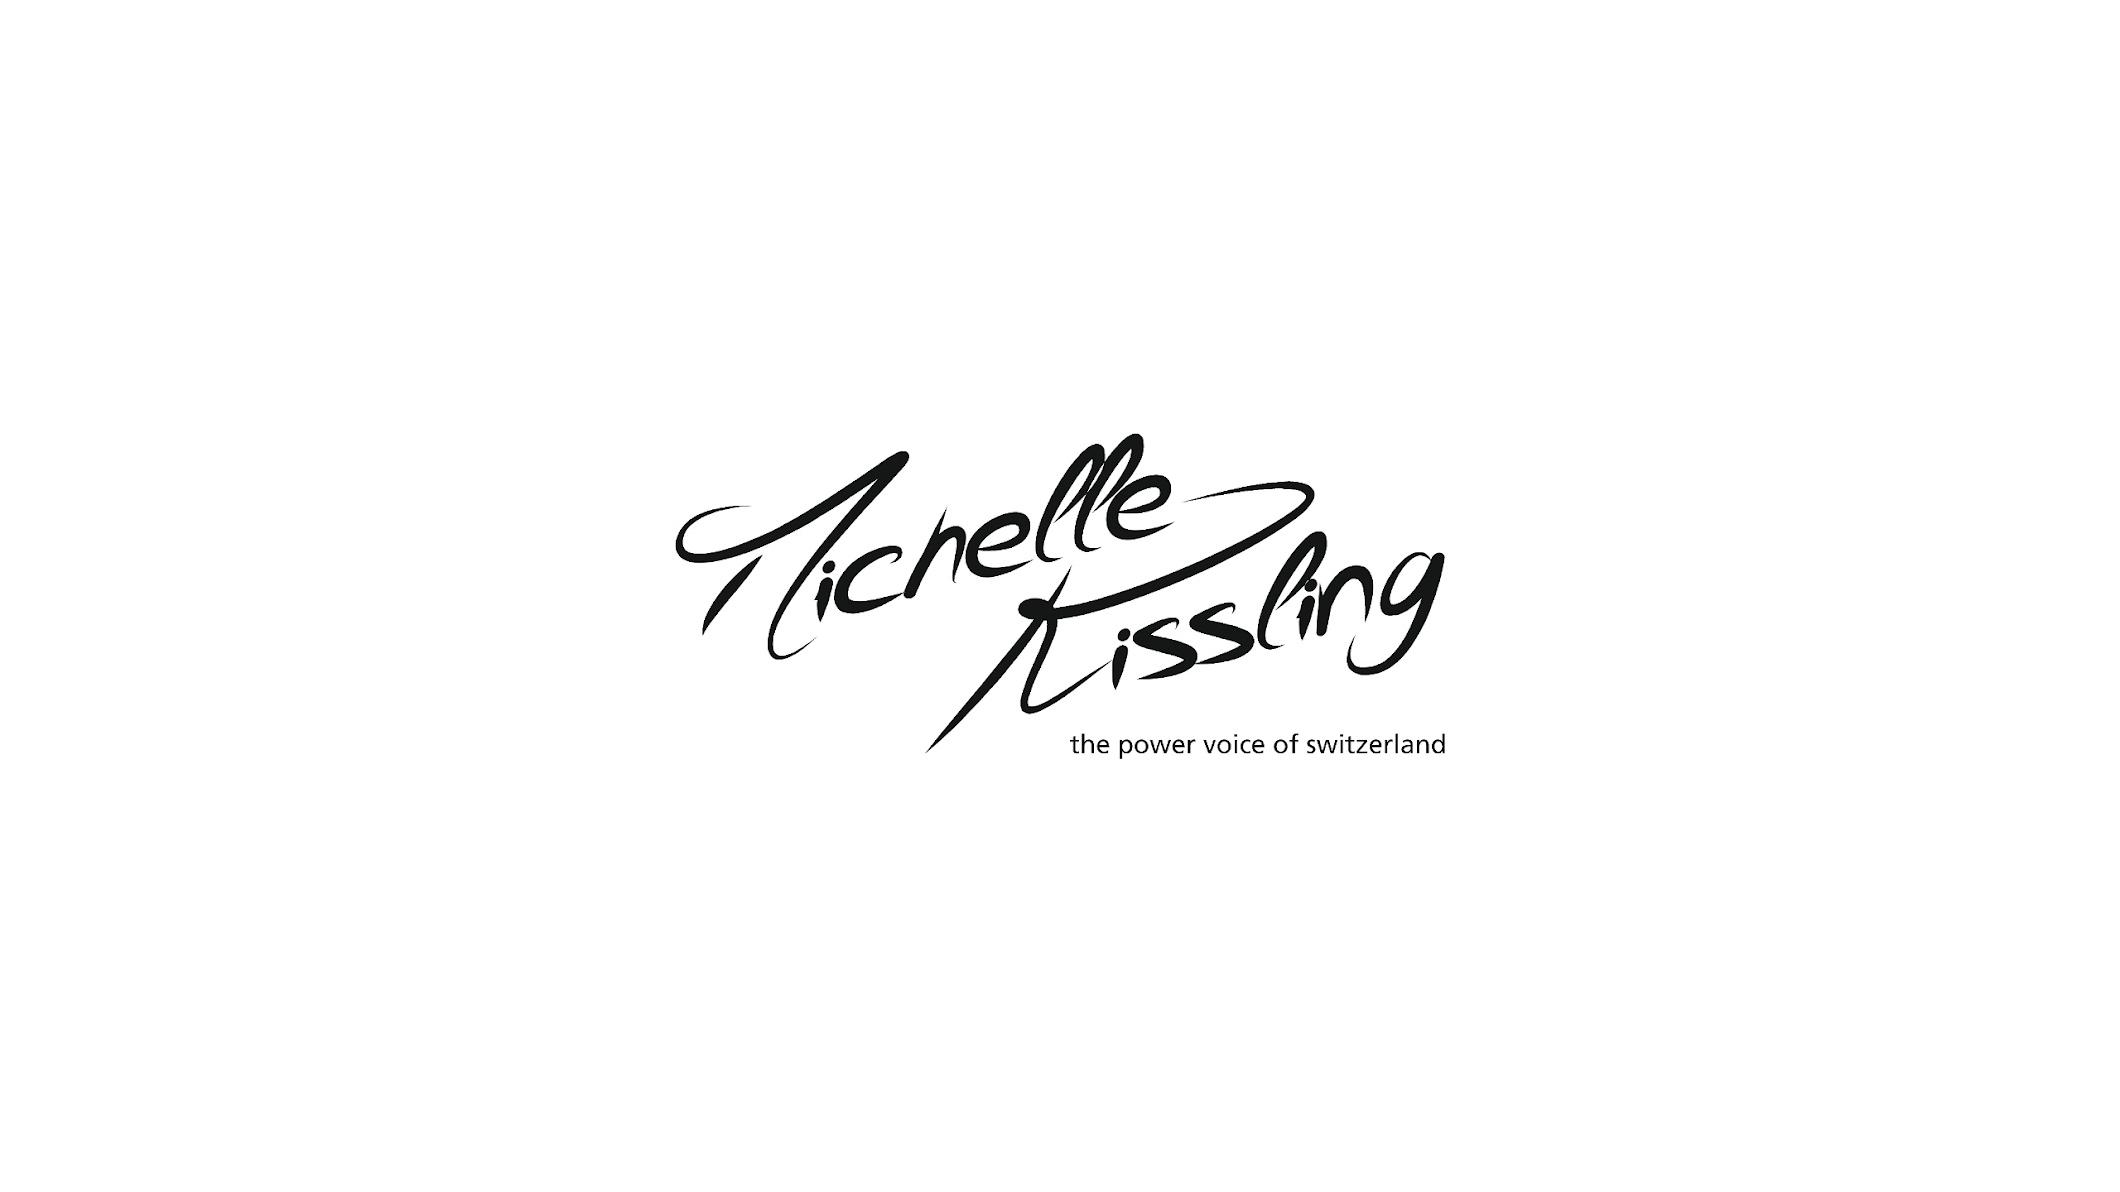 Michelle Kissling Official